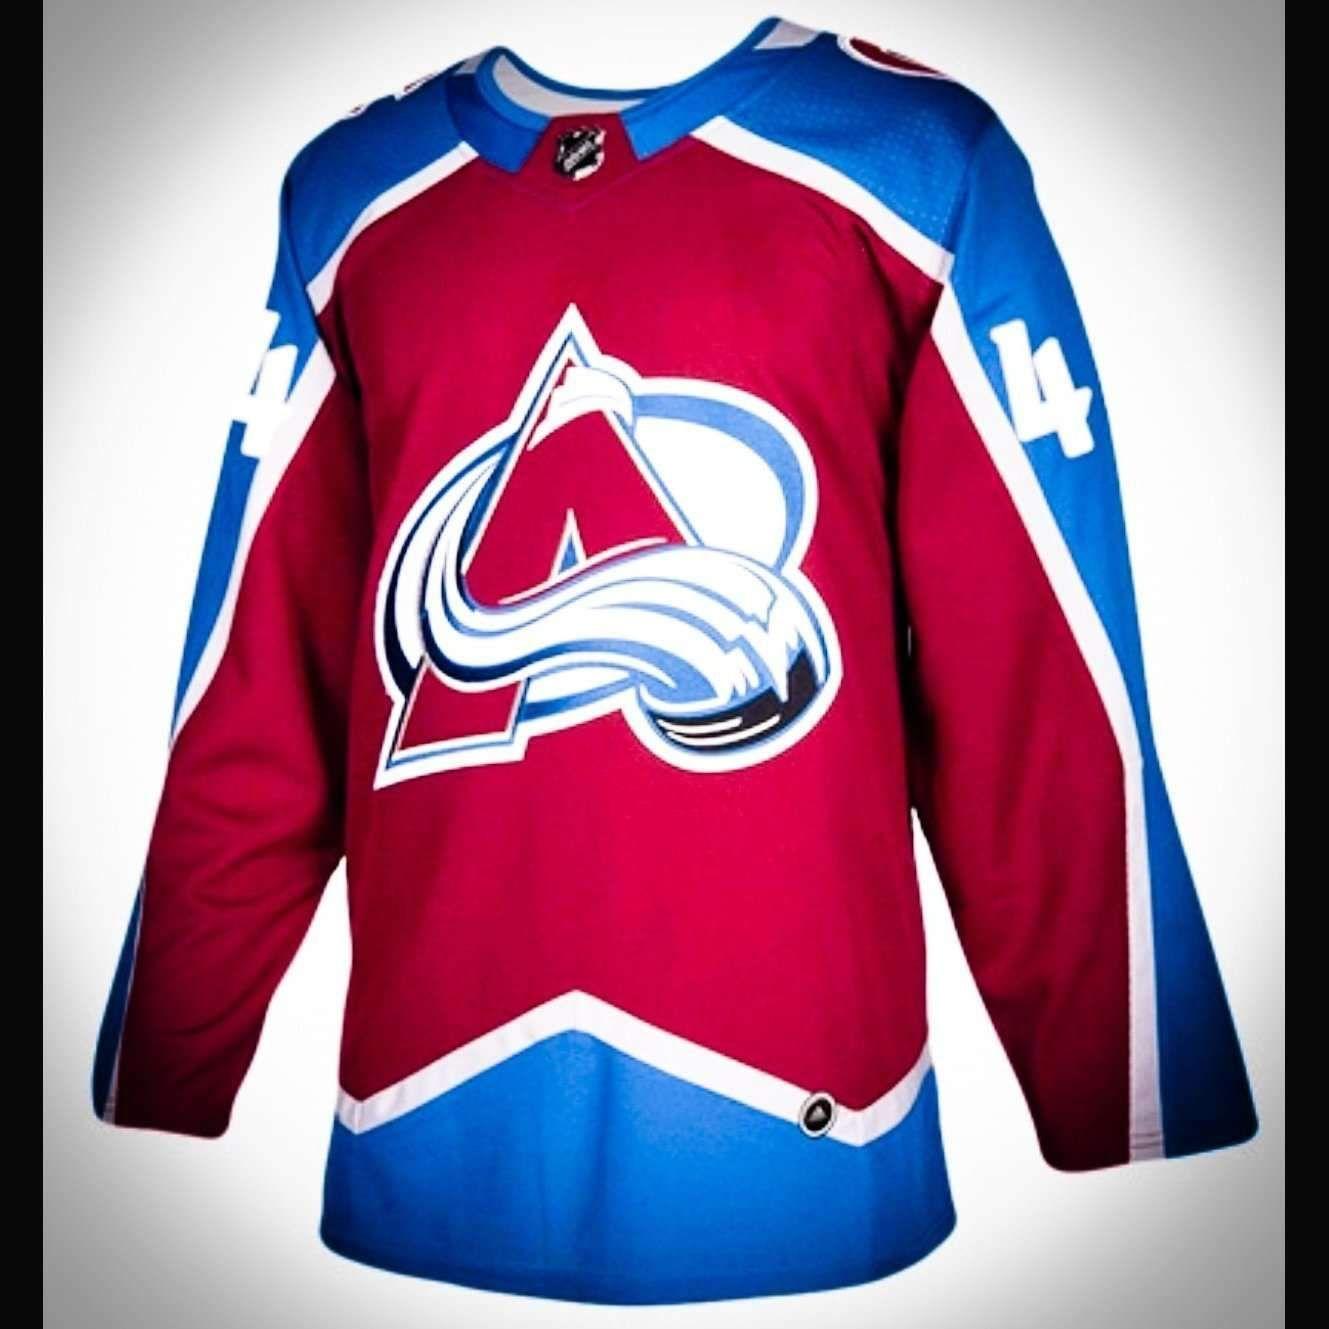 2b245b4e3 Colorado Avalanche Premier Adidas NHL Home - Road   Alt Jerseys ...